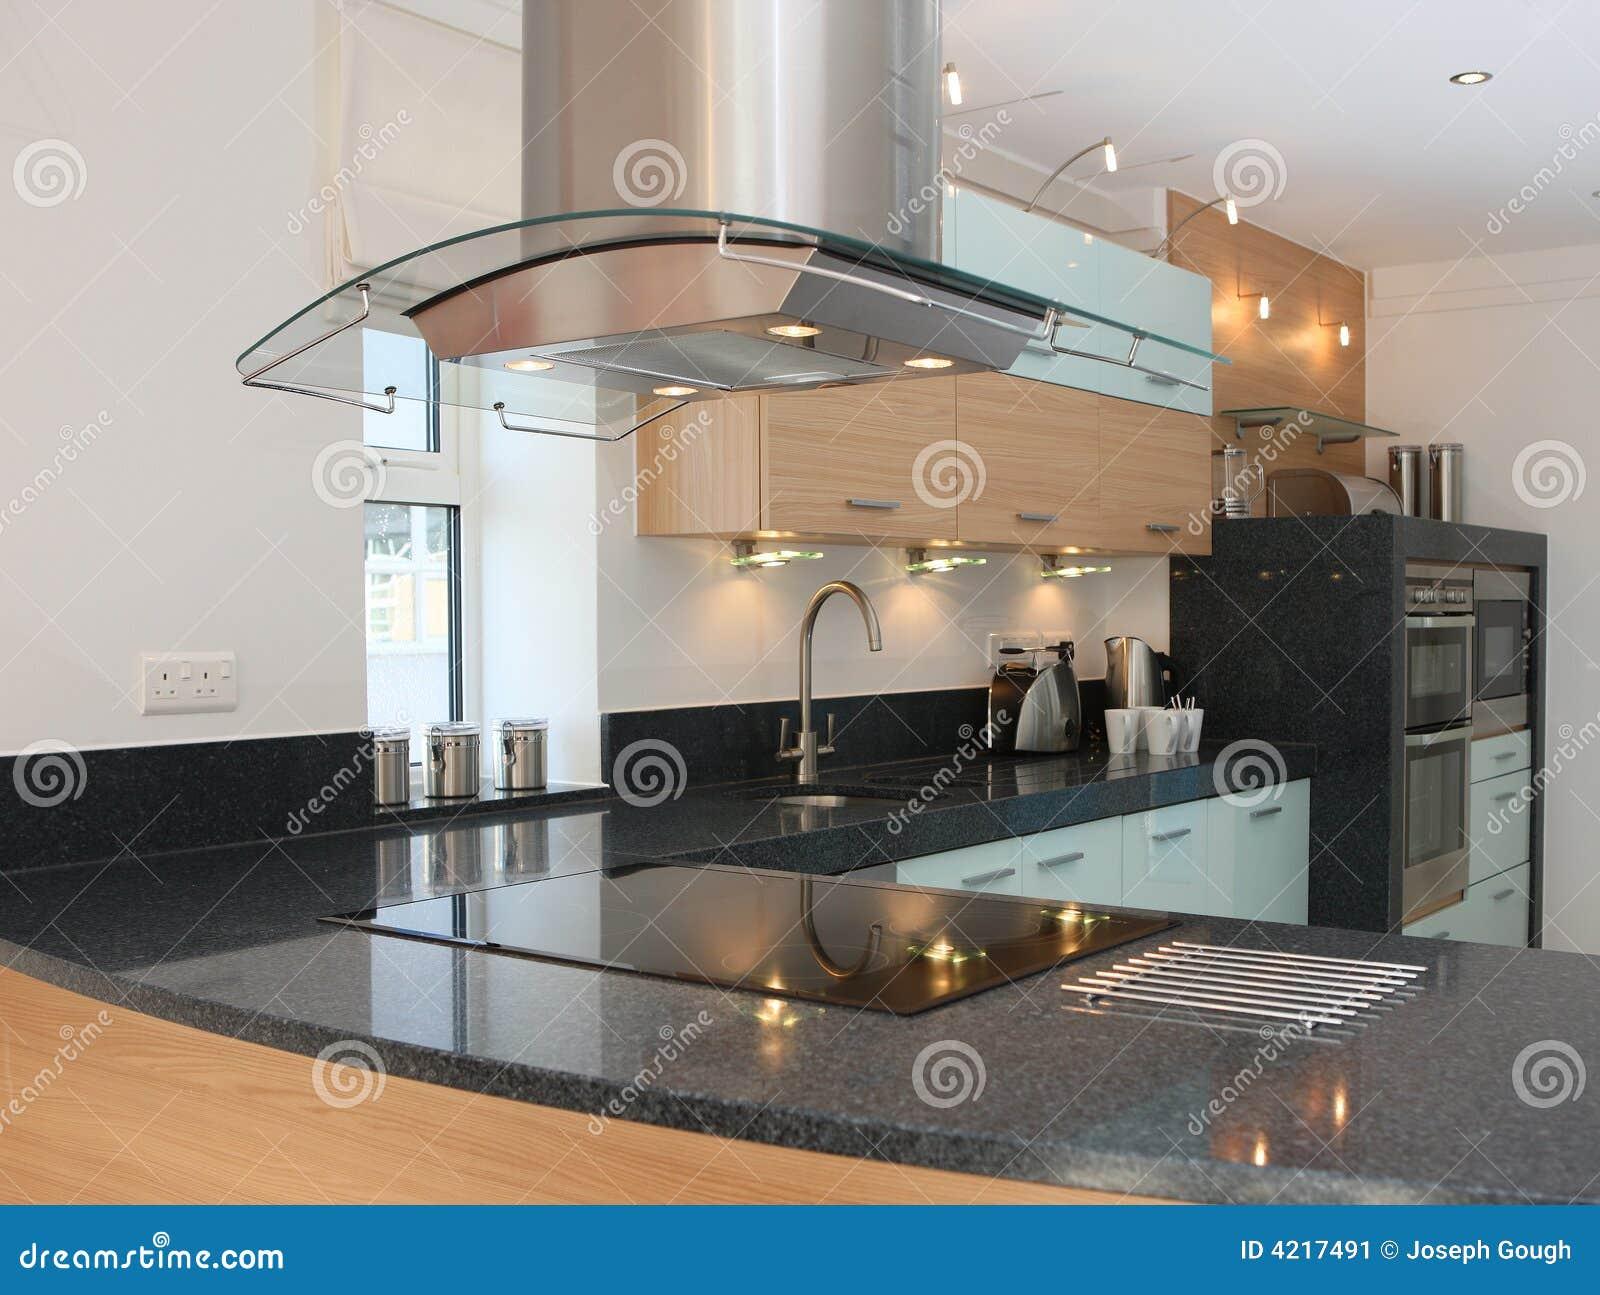 Luxury Modern Kitchen Interior Stock Image - Image: 4217491